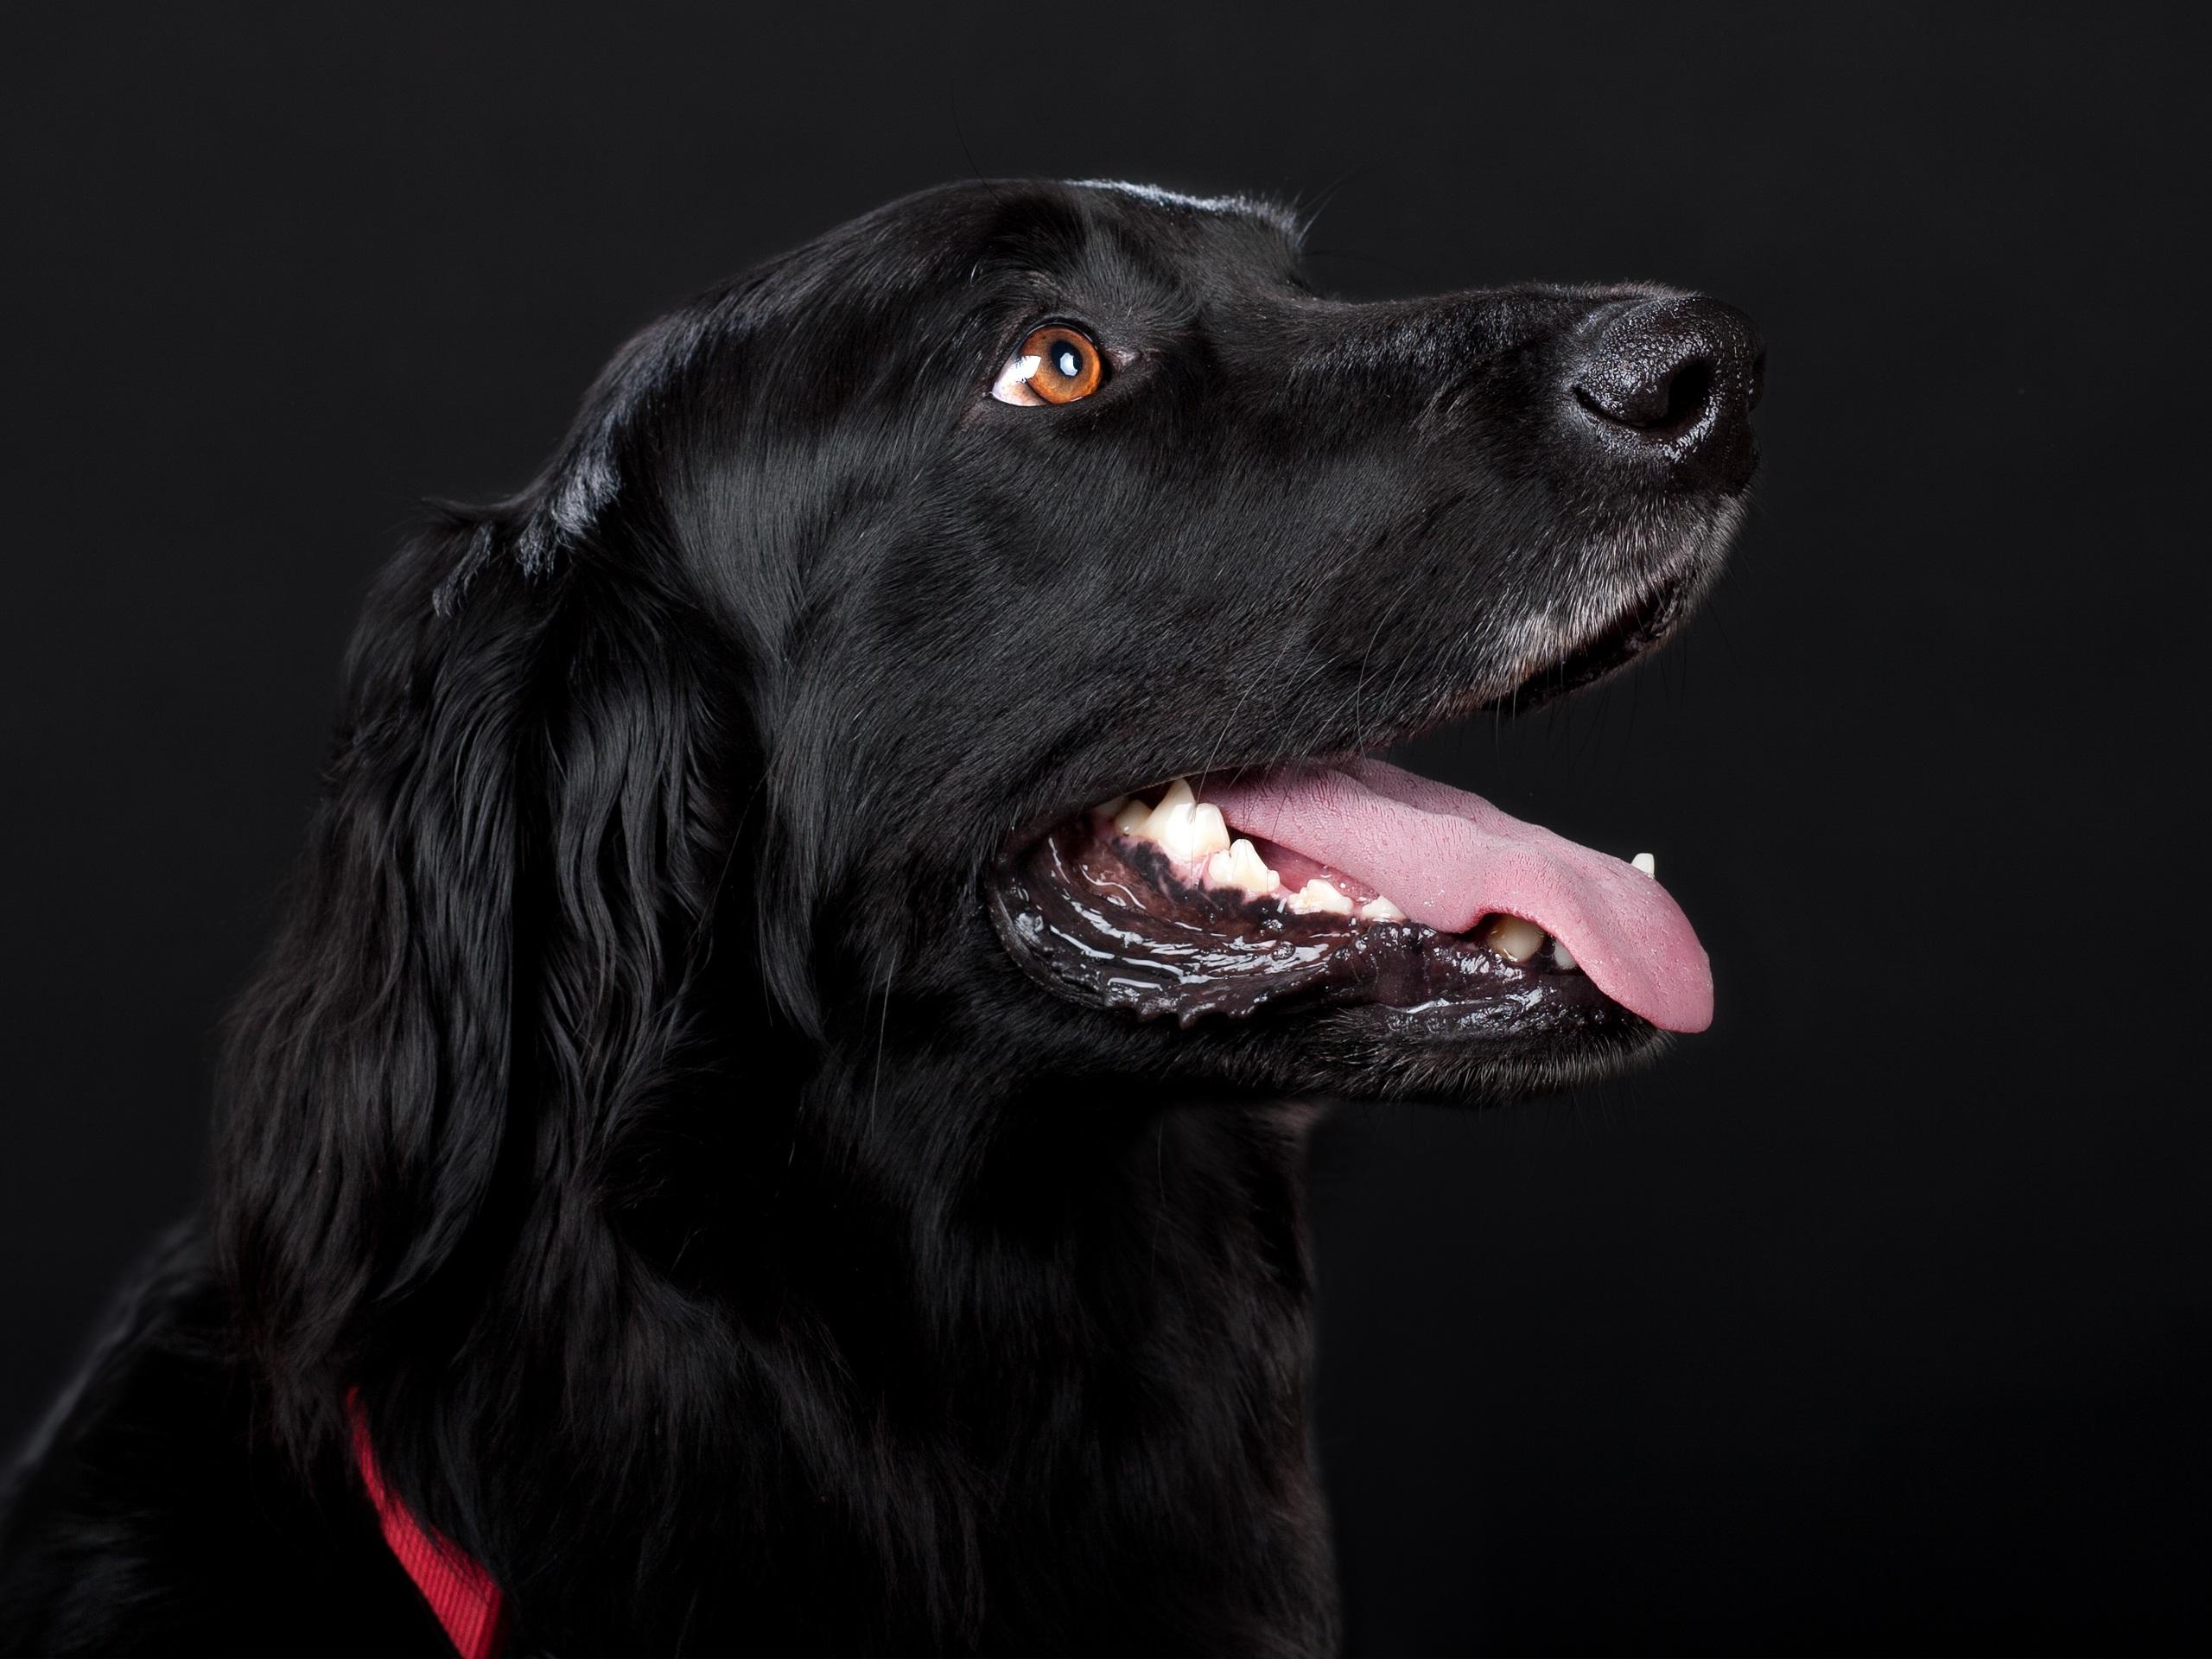 Black Dog, Loyal, Pet, Friend, Free dog photos, HQ Photo